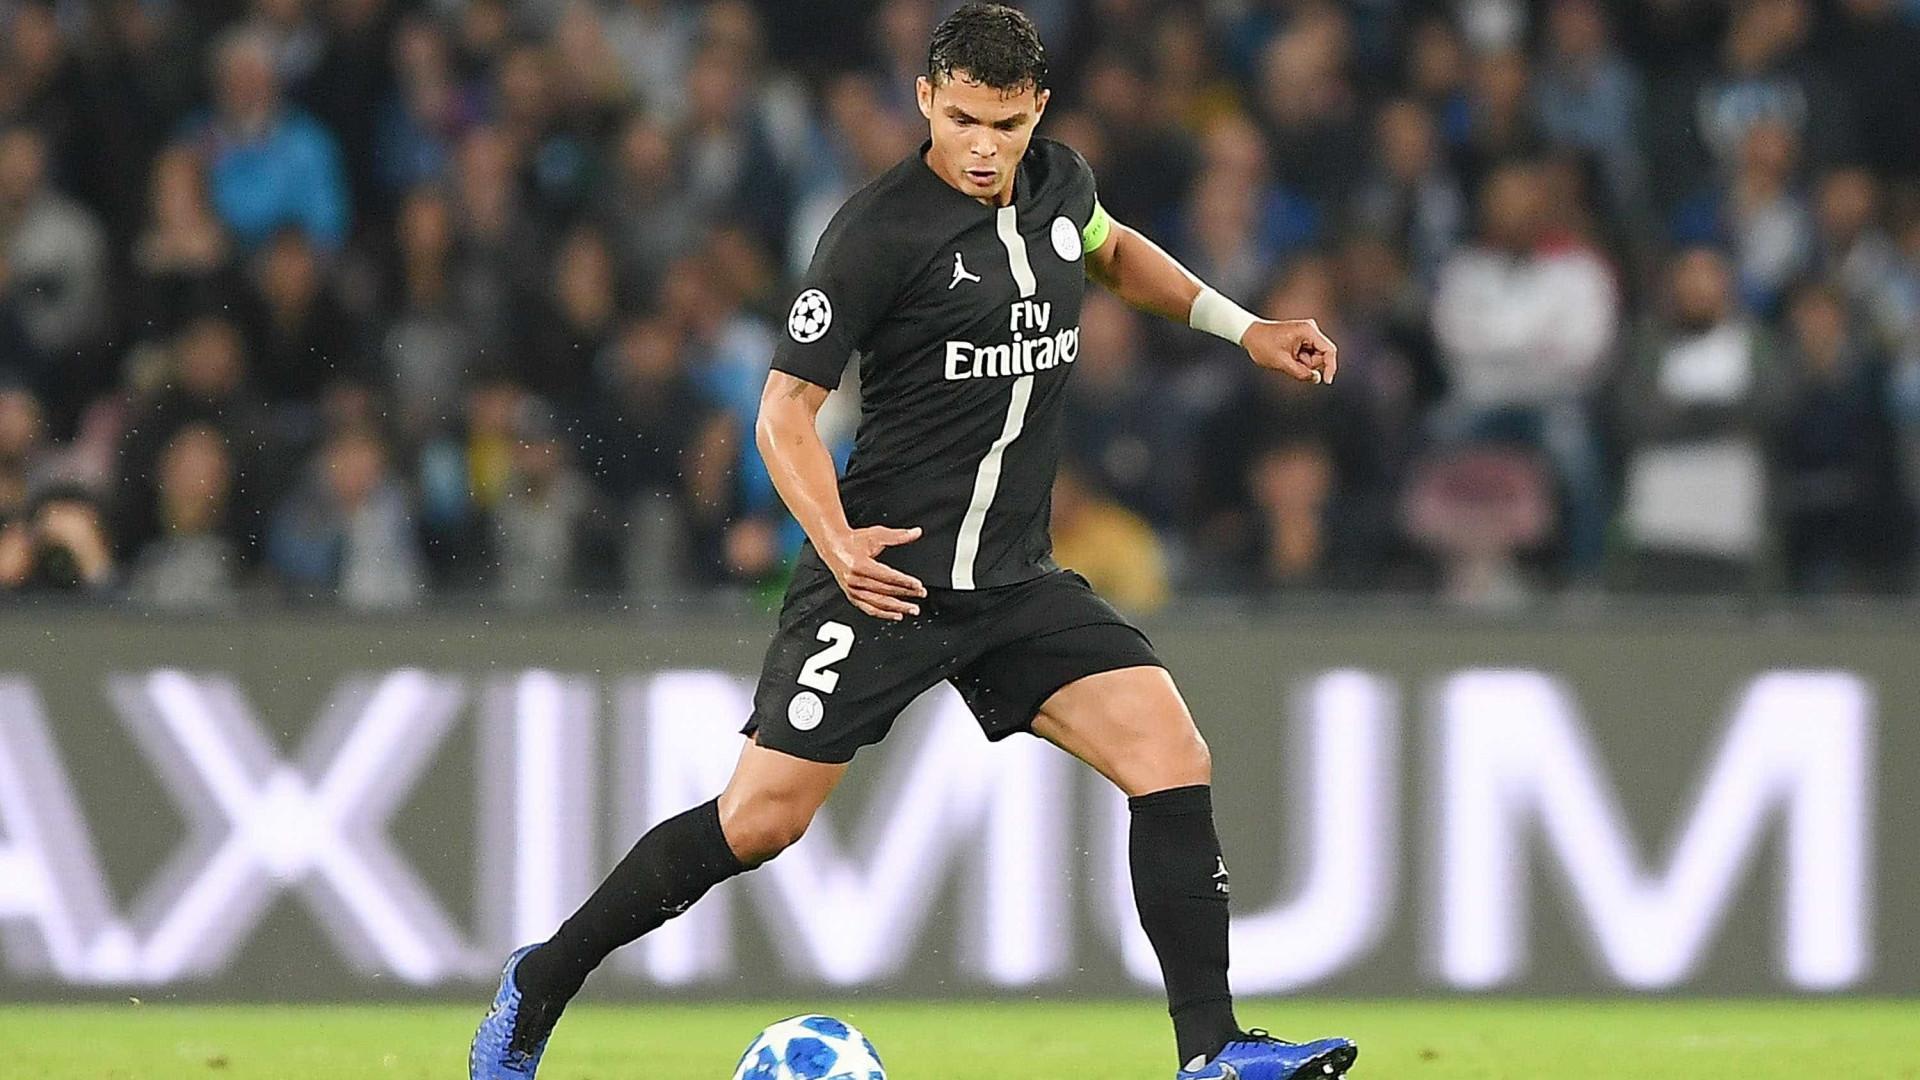 PSG sofre sem Neymar e Mbappé, mas bate o Toulouse e mantém os 100%